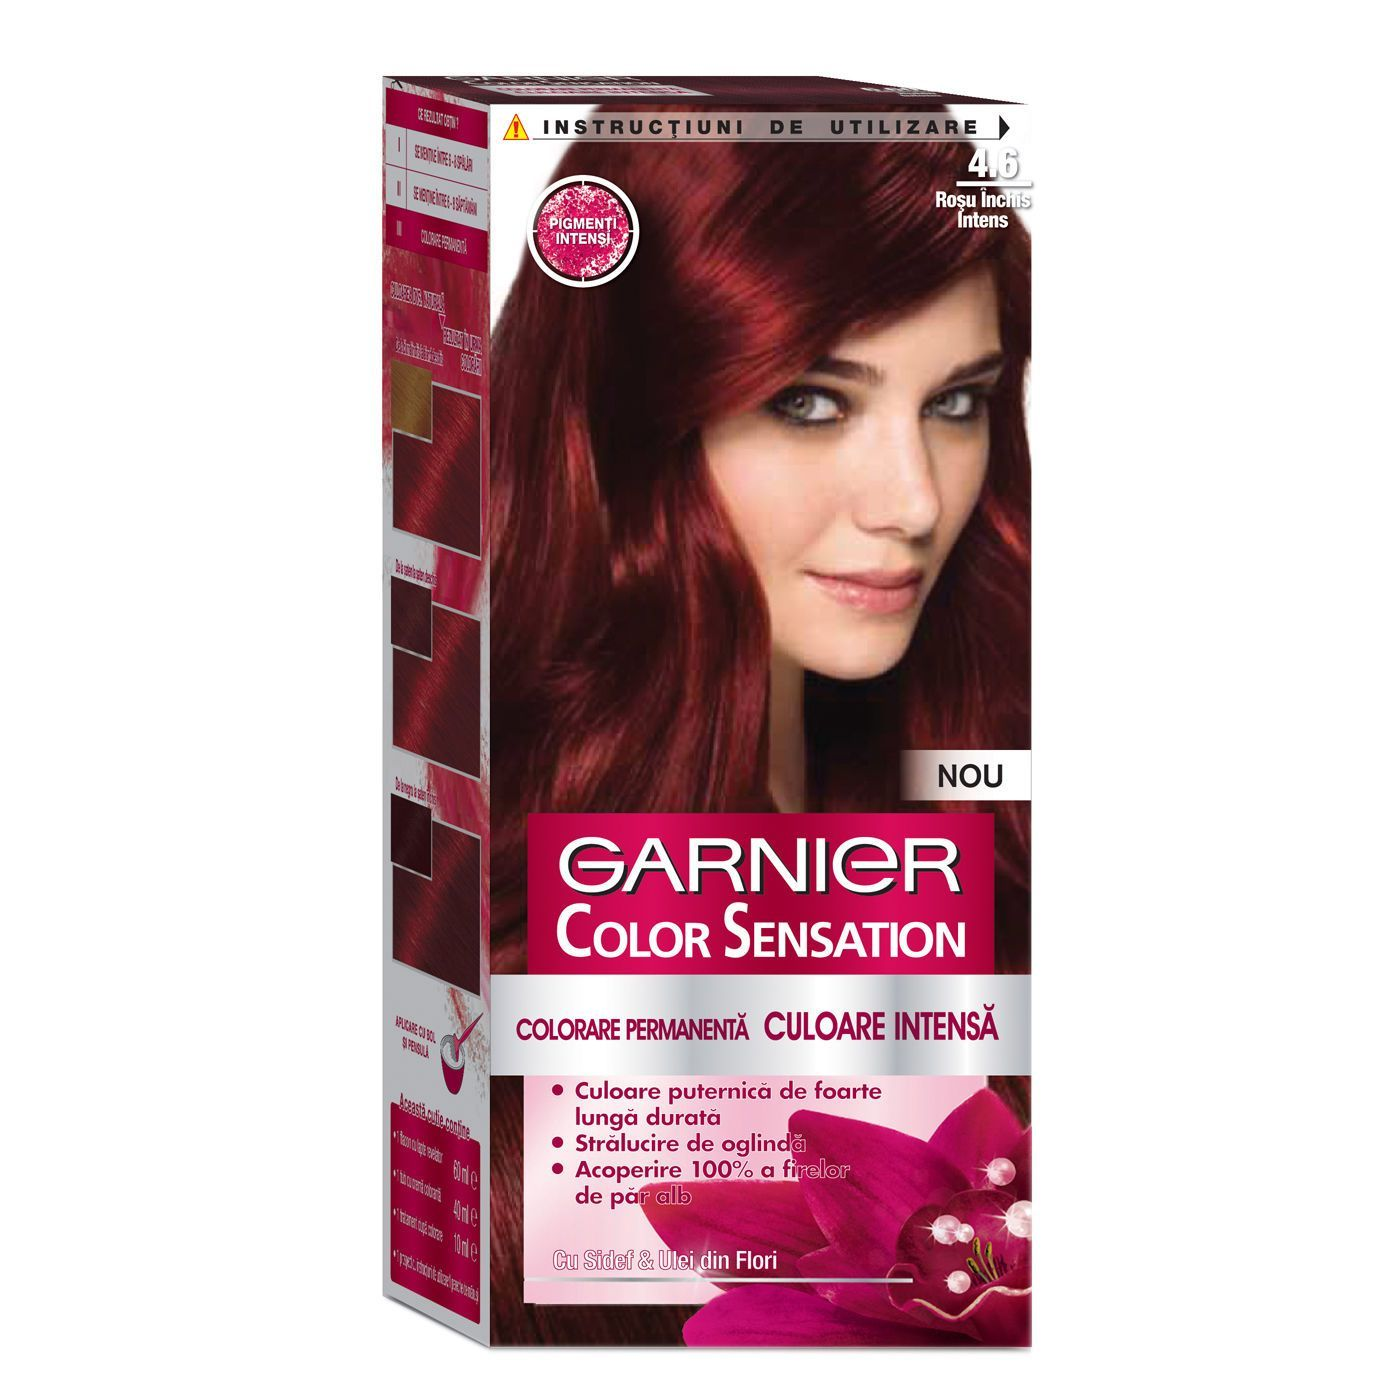 Garnier Color Sensation 4 60 Intense Dark Red Hair Dye Permanent Cream Color Dyed Red Hair Dark Red Hair Dye Dyed Hair